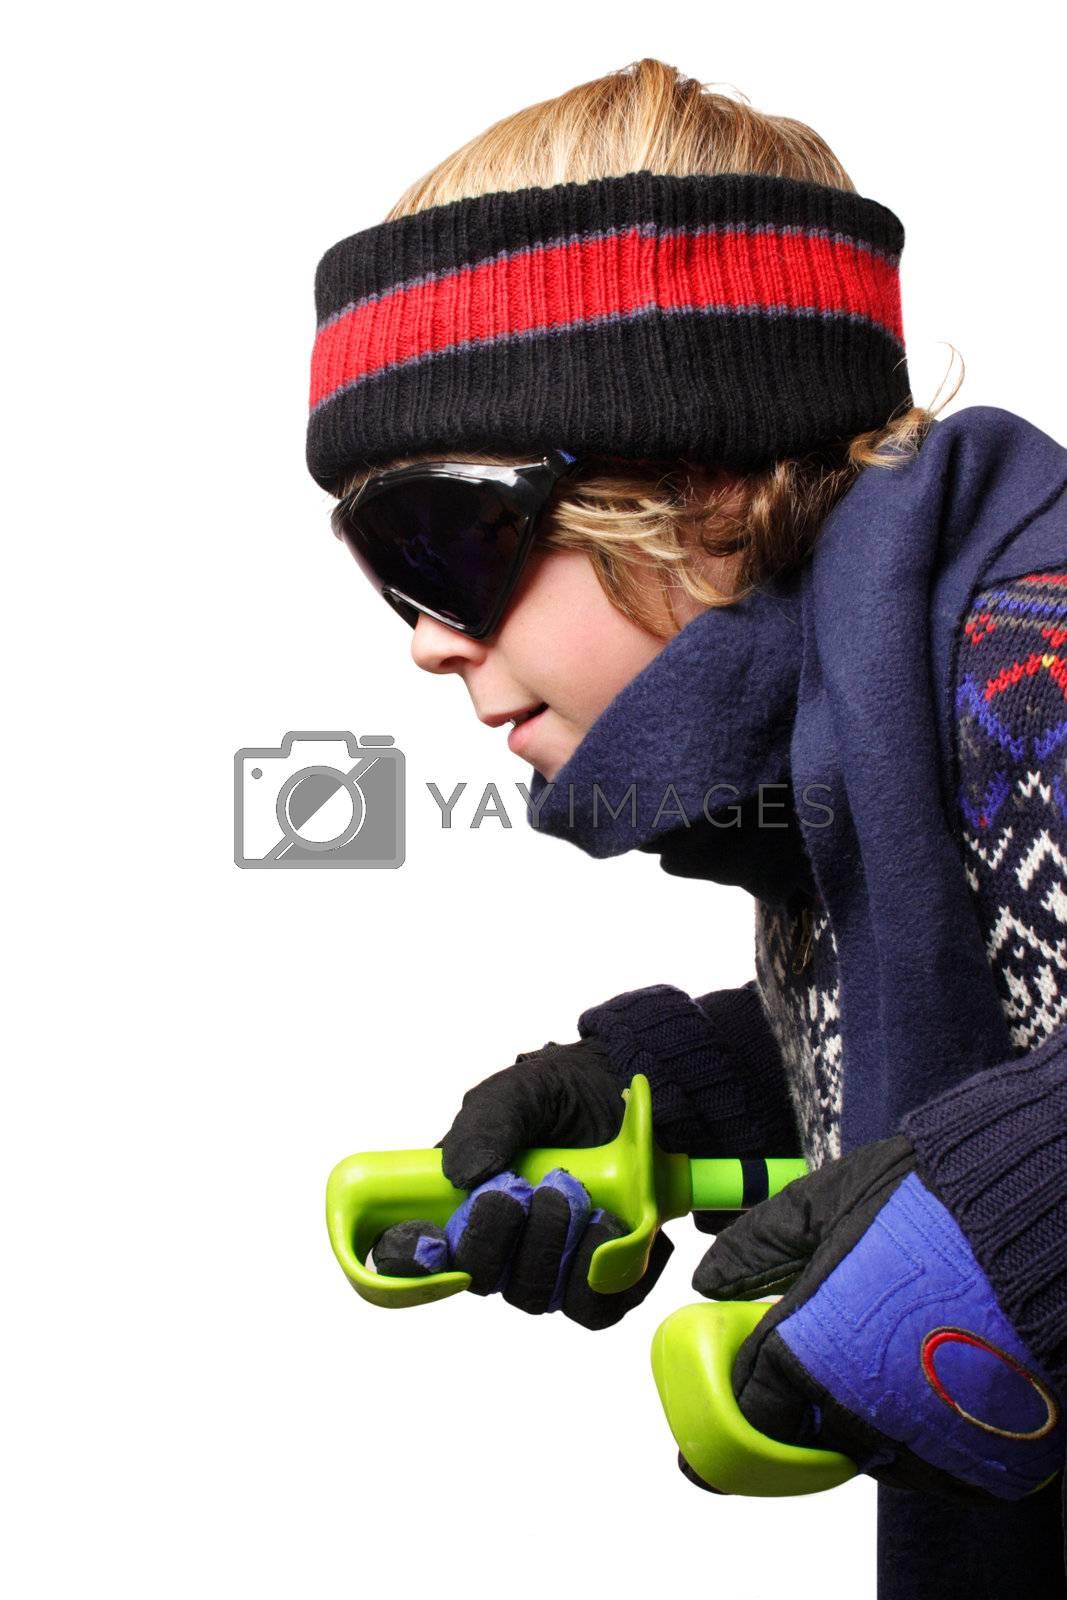 Isolated shot of a boy crouching holding ski poles